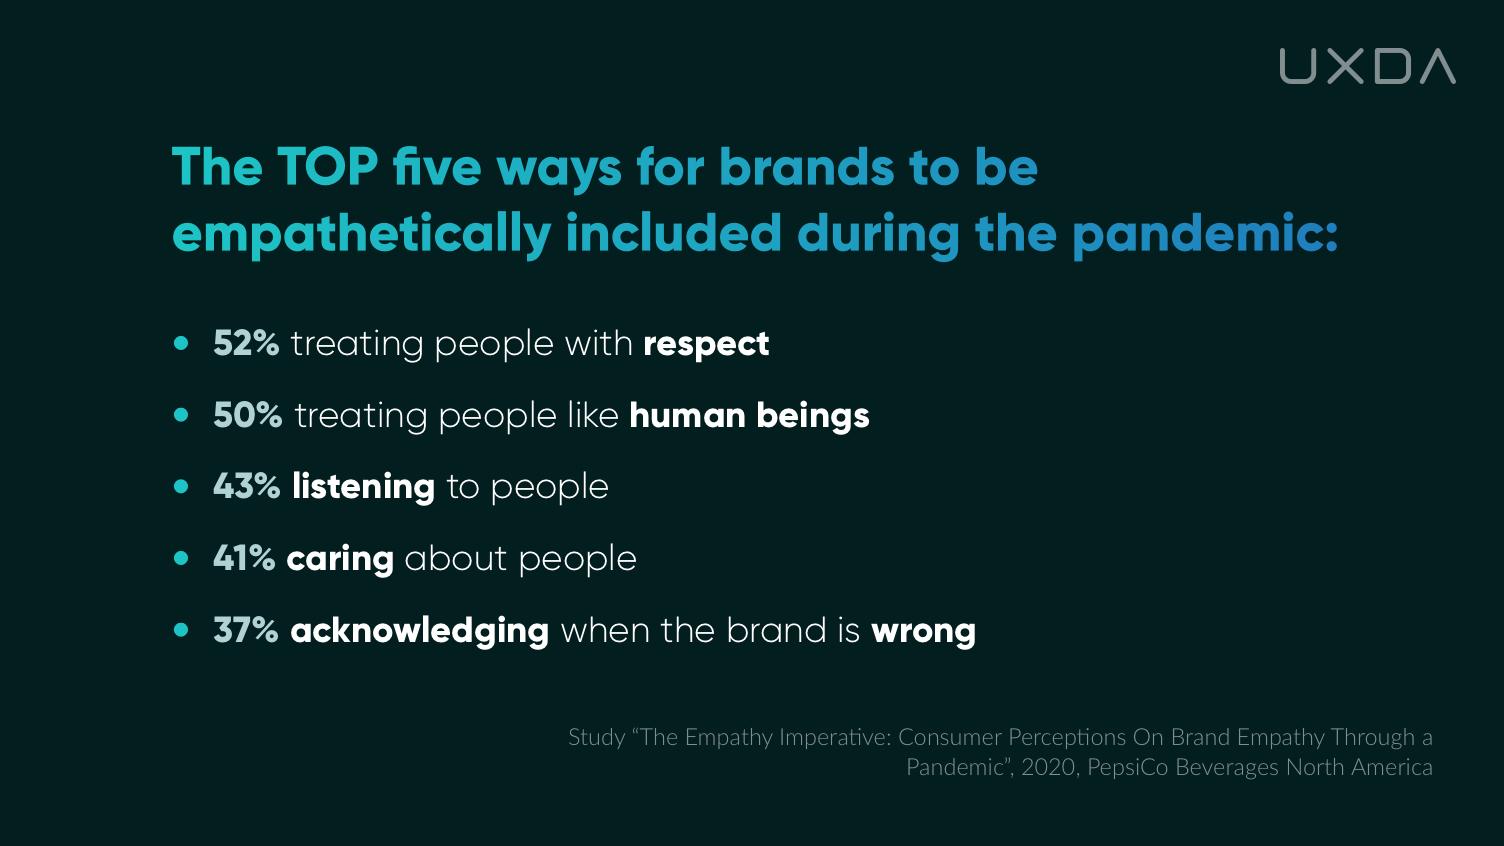 digital-banking-customer-experience-trends-9.jpg